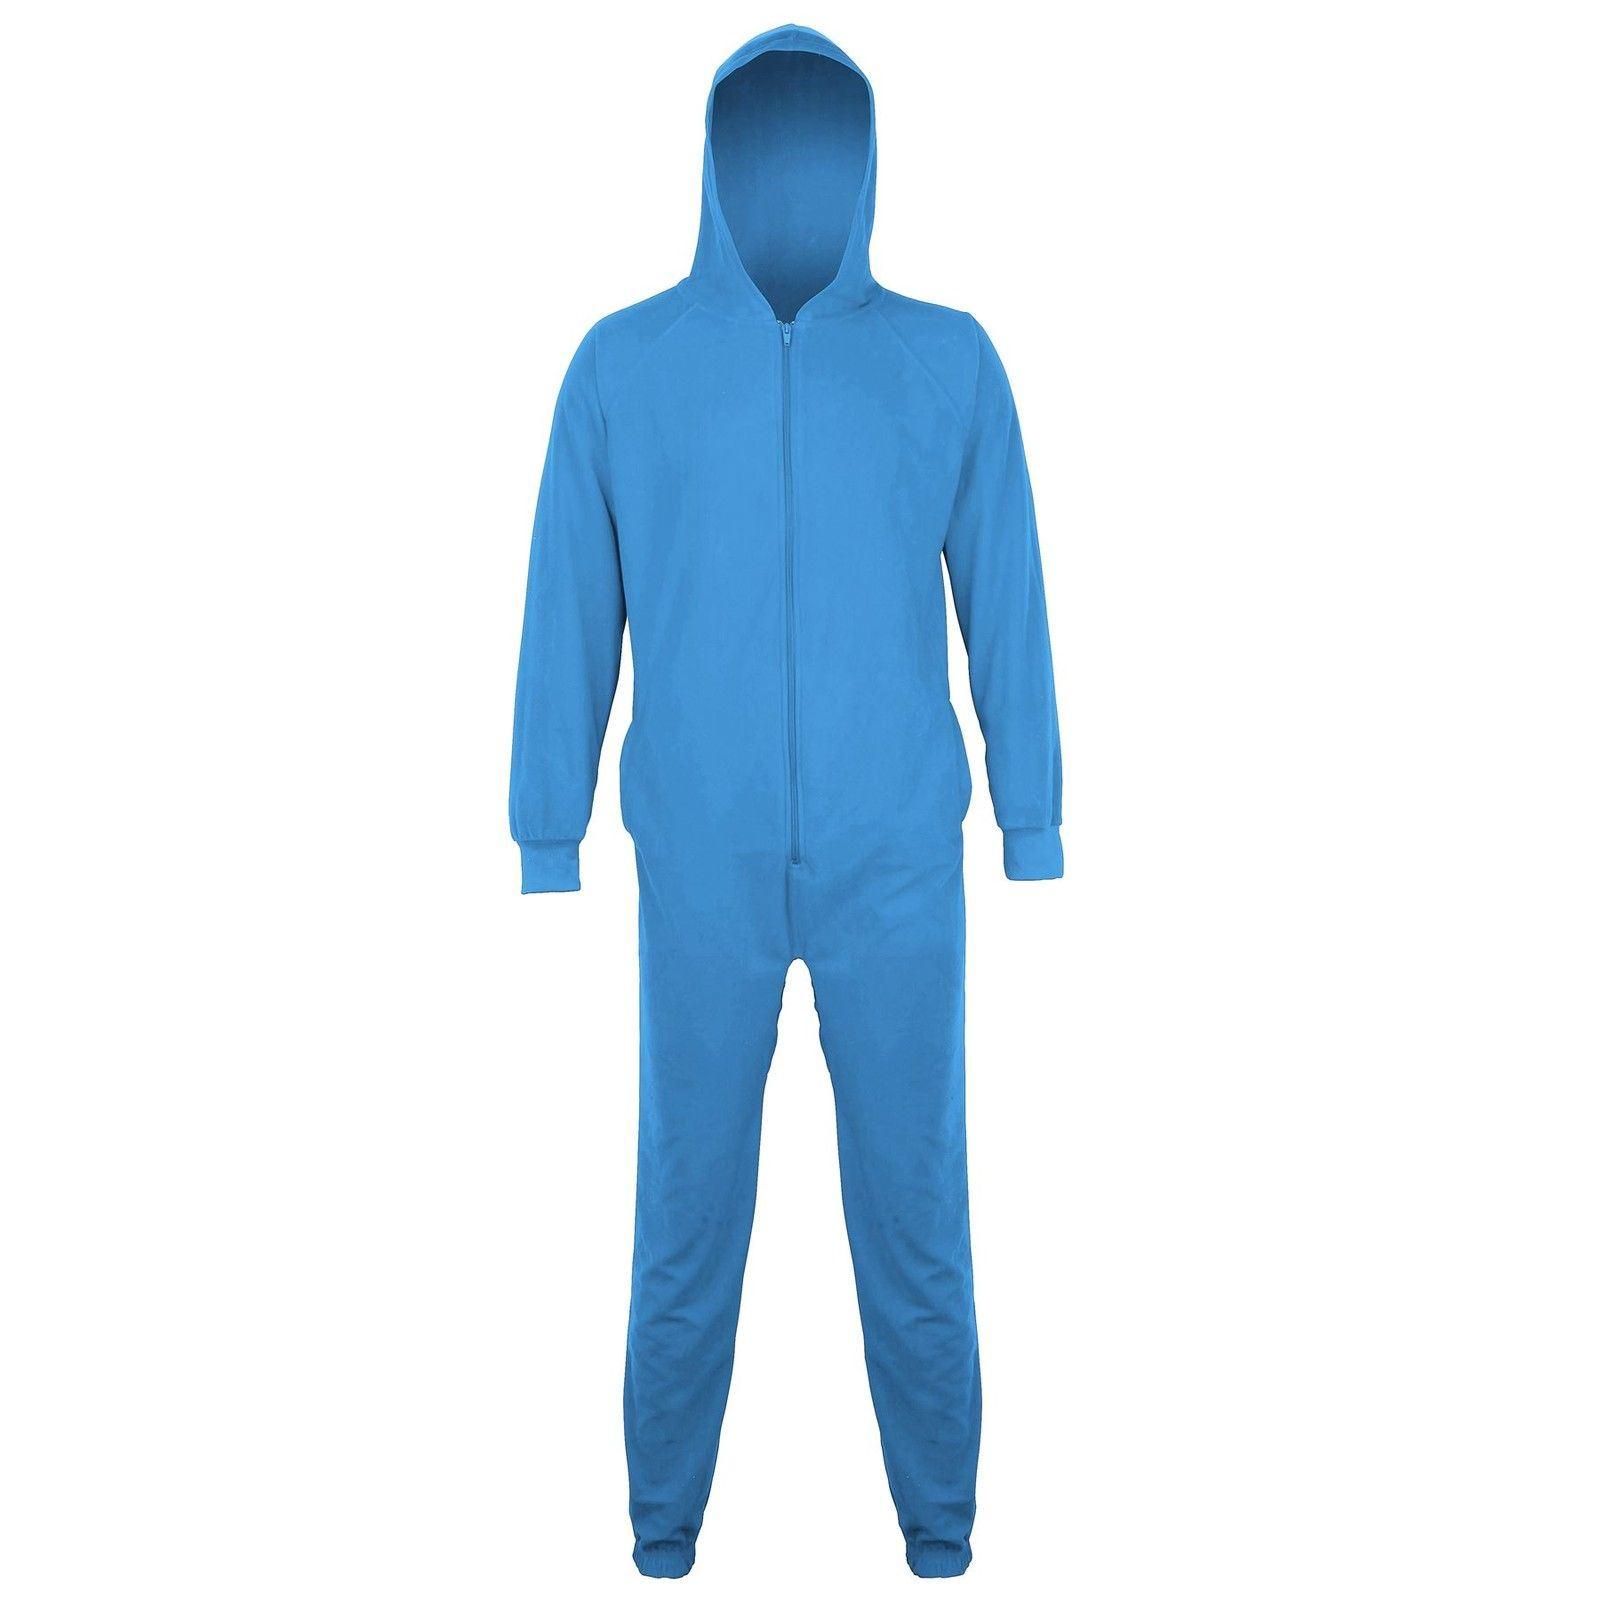 damen oder herren winter essential kapuze soft fleece einteiler pyjama ebay. Black Bedroom Furniture Sets. Home Design Ideas